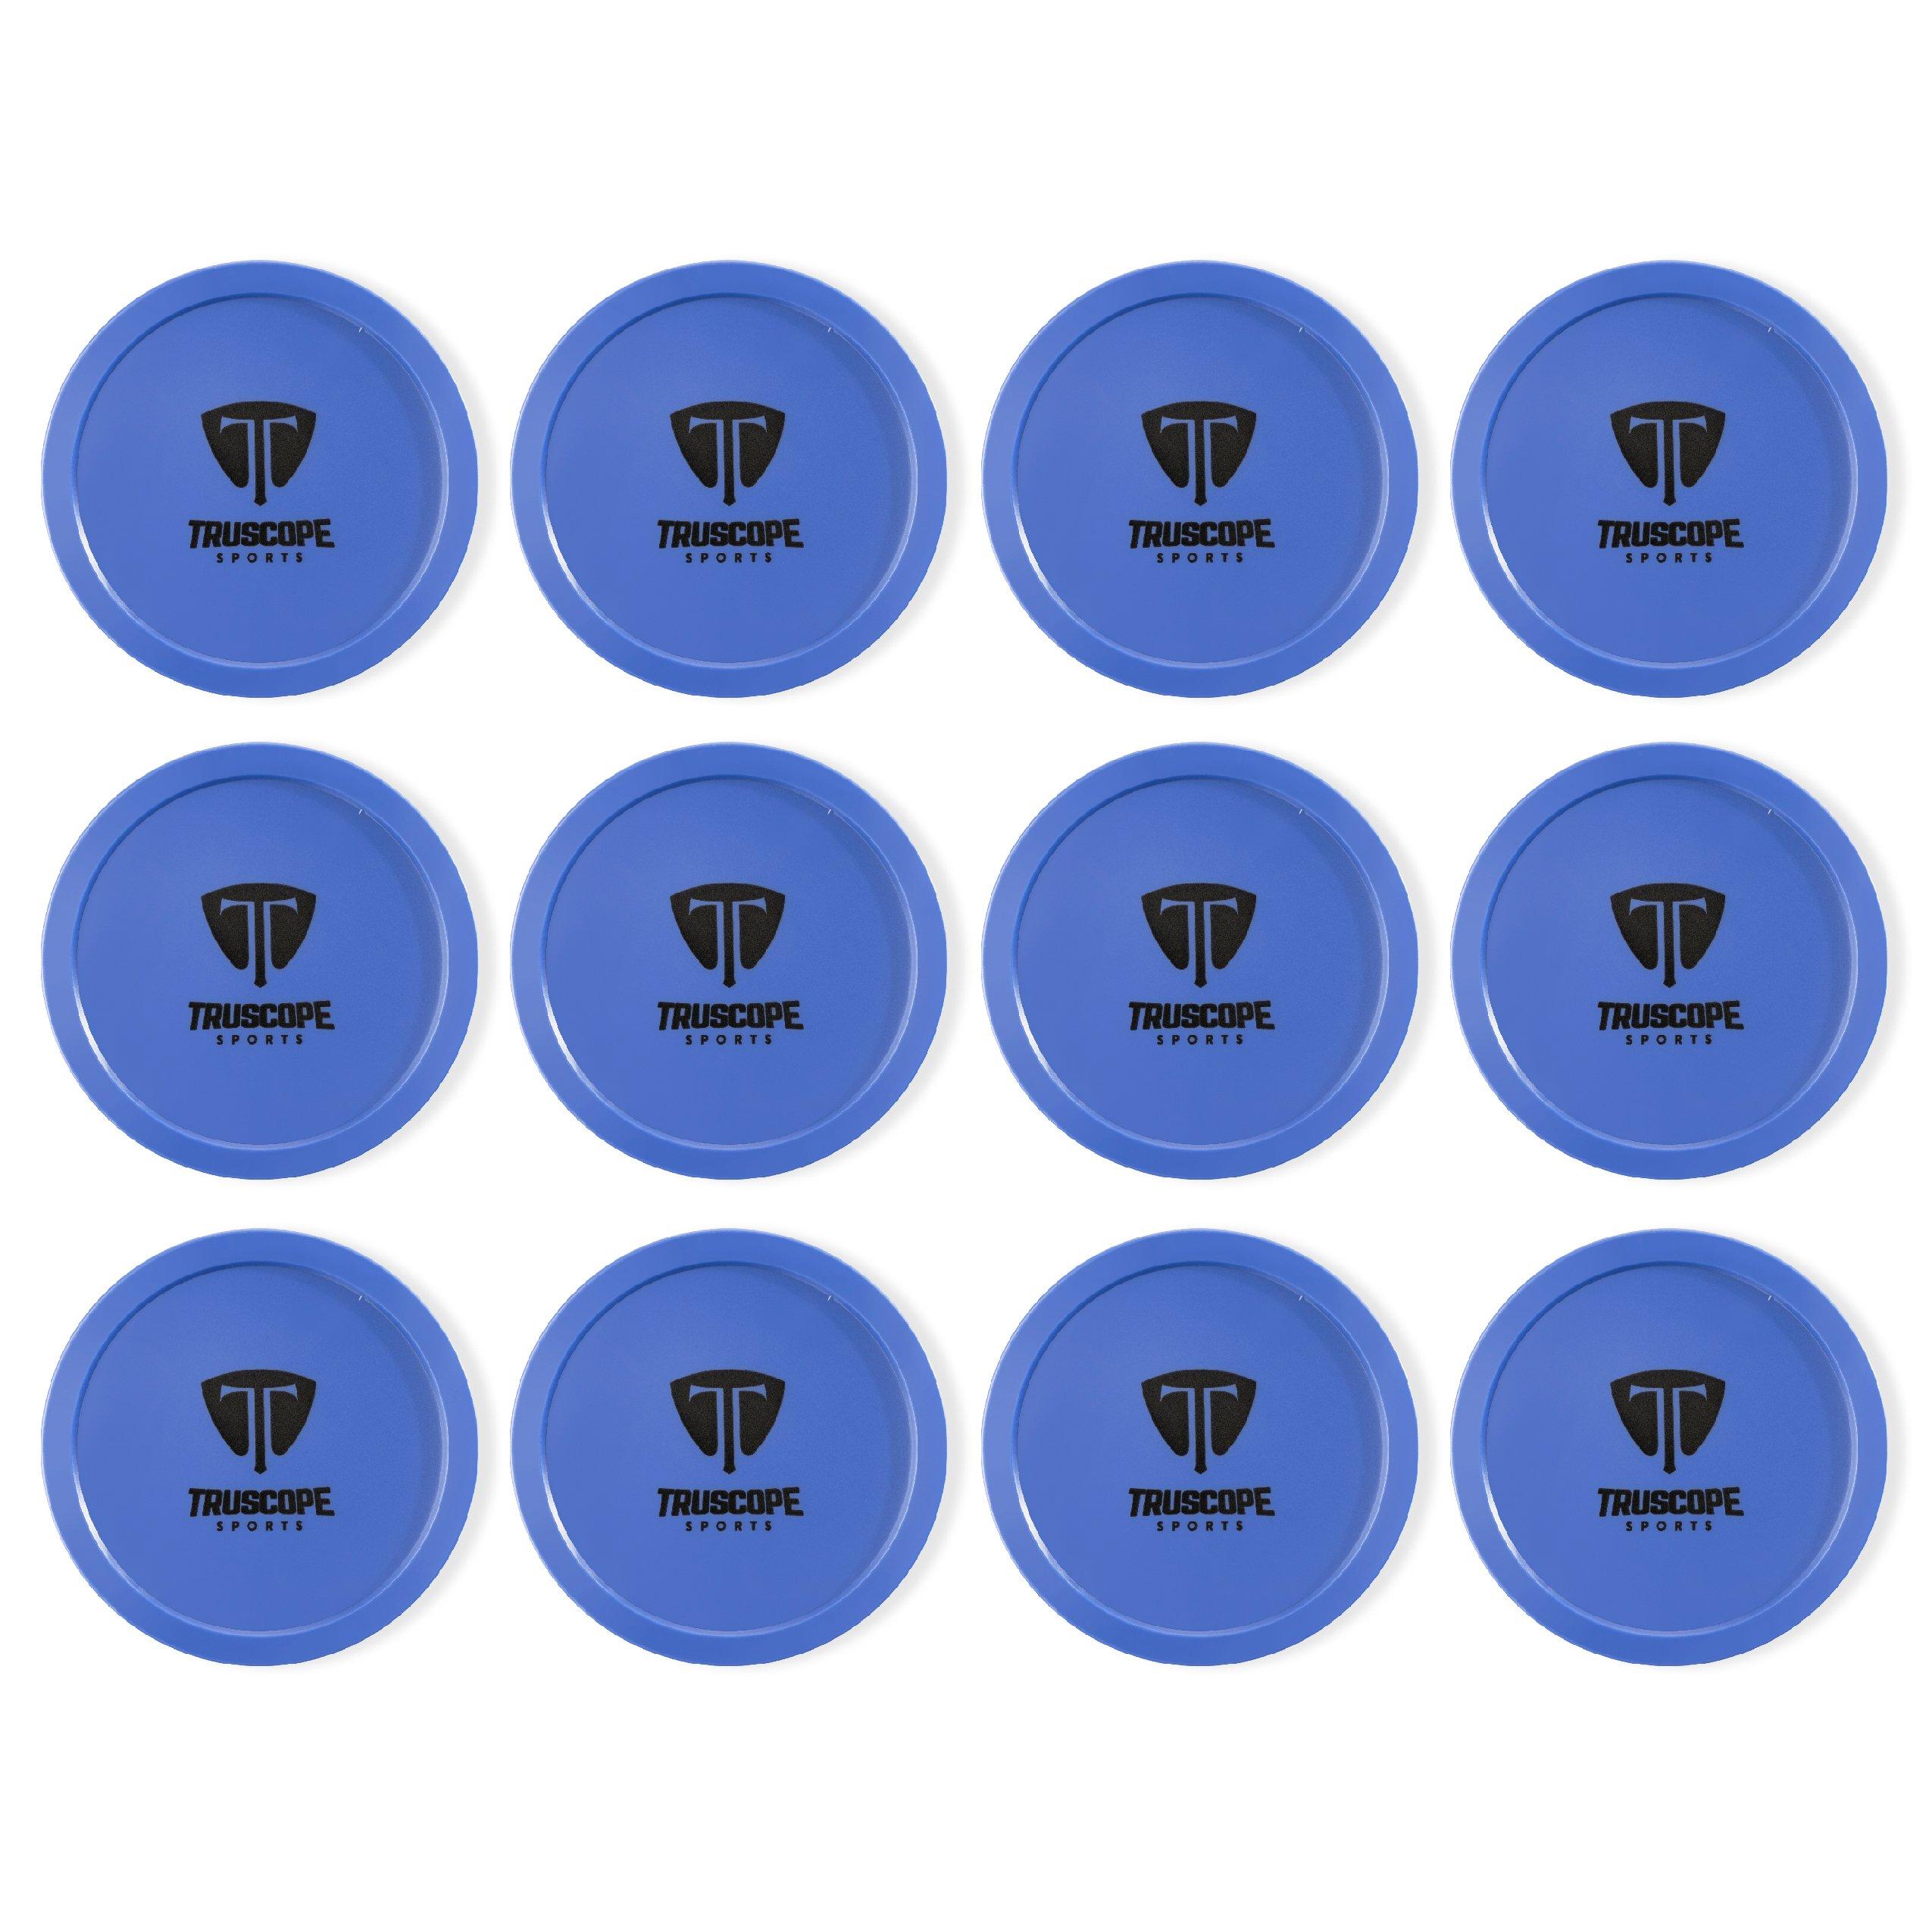 Truscope Sports 12 Pack 3 1/4 Inch Air Hockey Pucks (Blue)